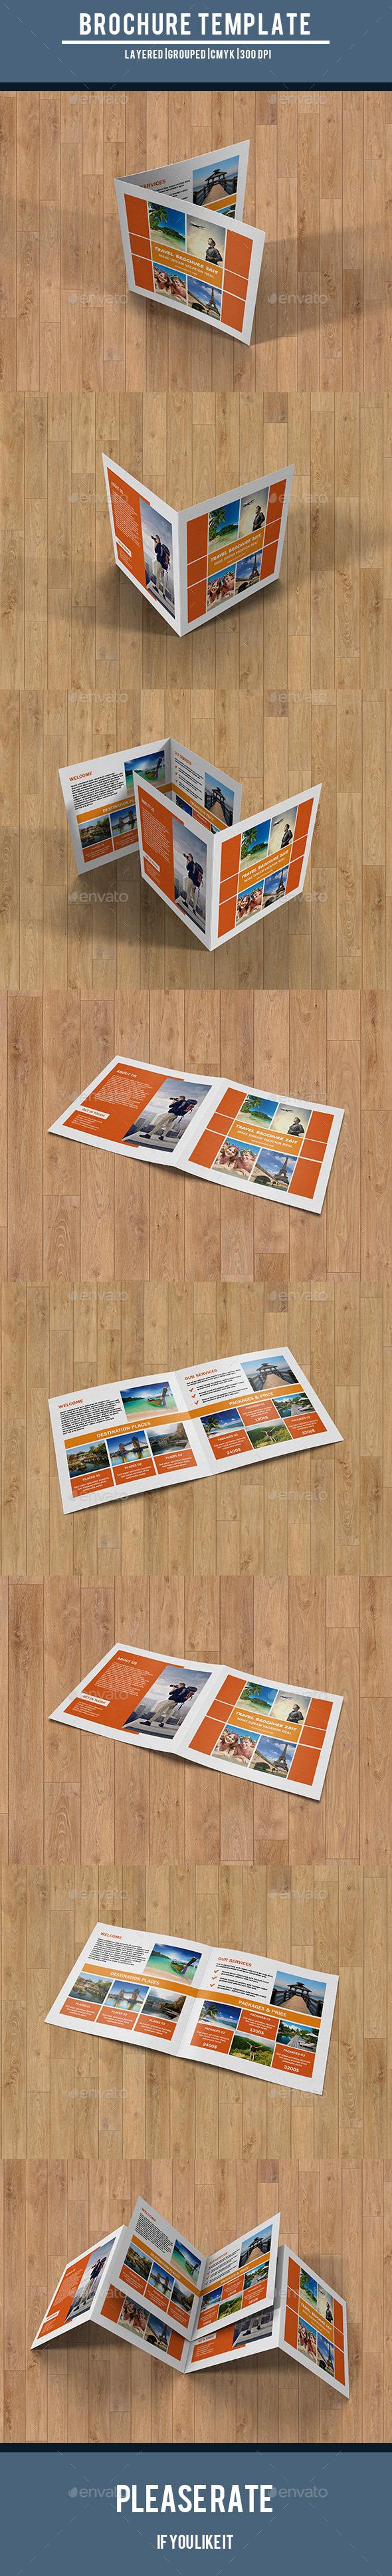 Travel Square Brochure-V214 - Corporate Brochures